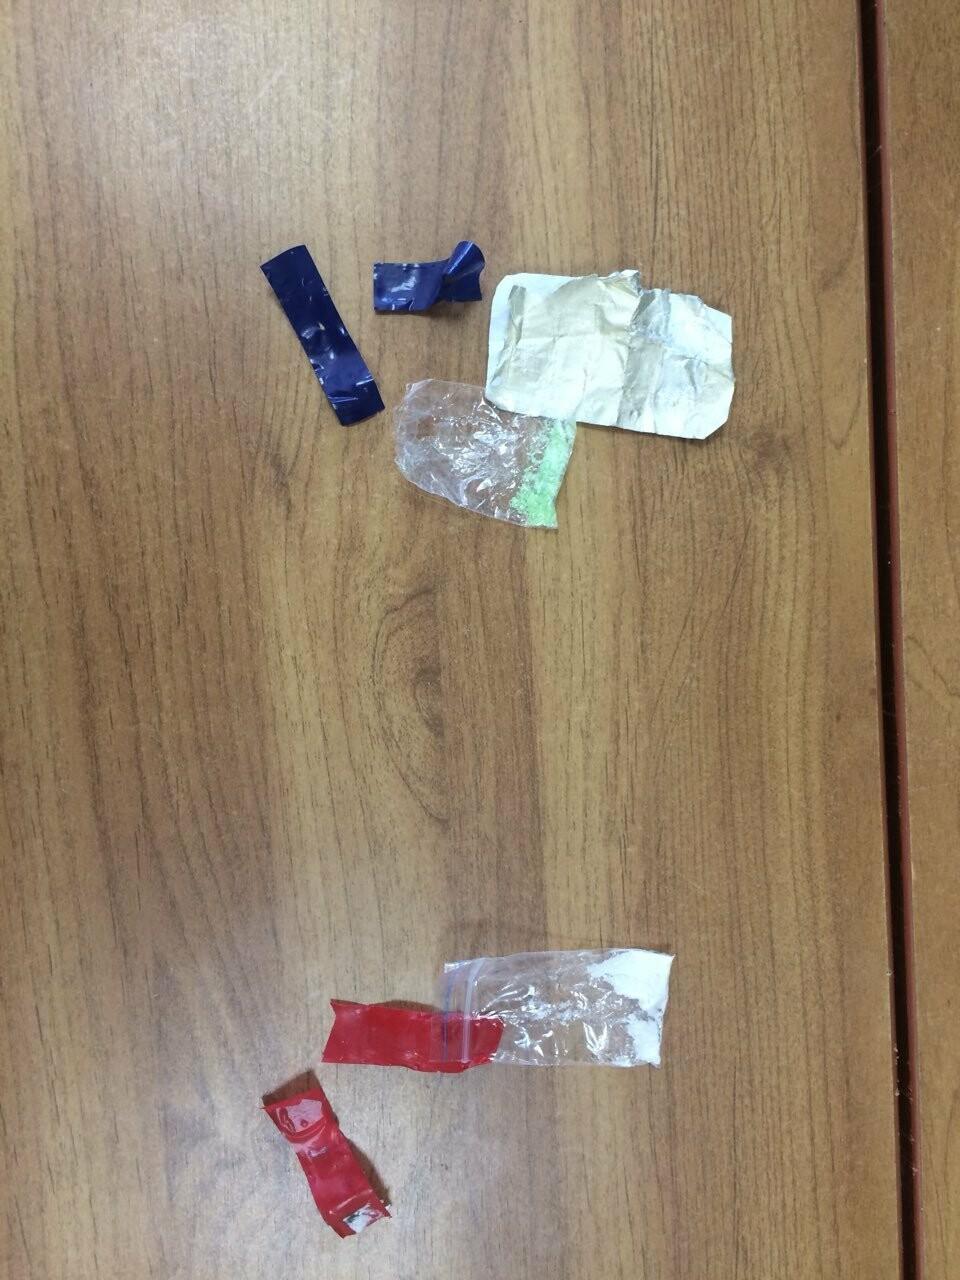 В Пскове сотрудники ОМОН задержали гражданина подозреваемого в хранении наркотиков, фото-1